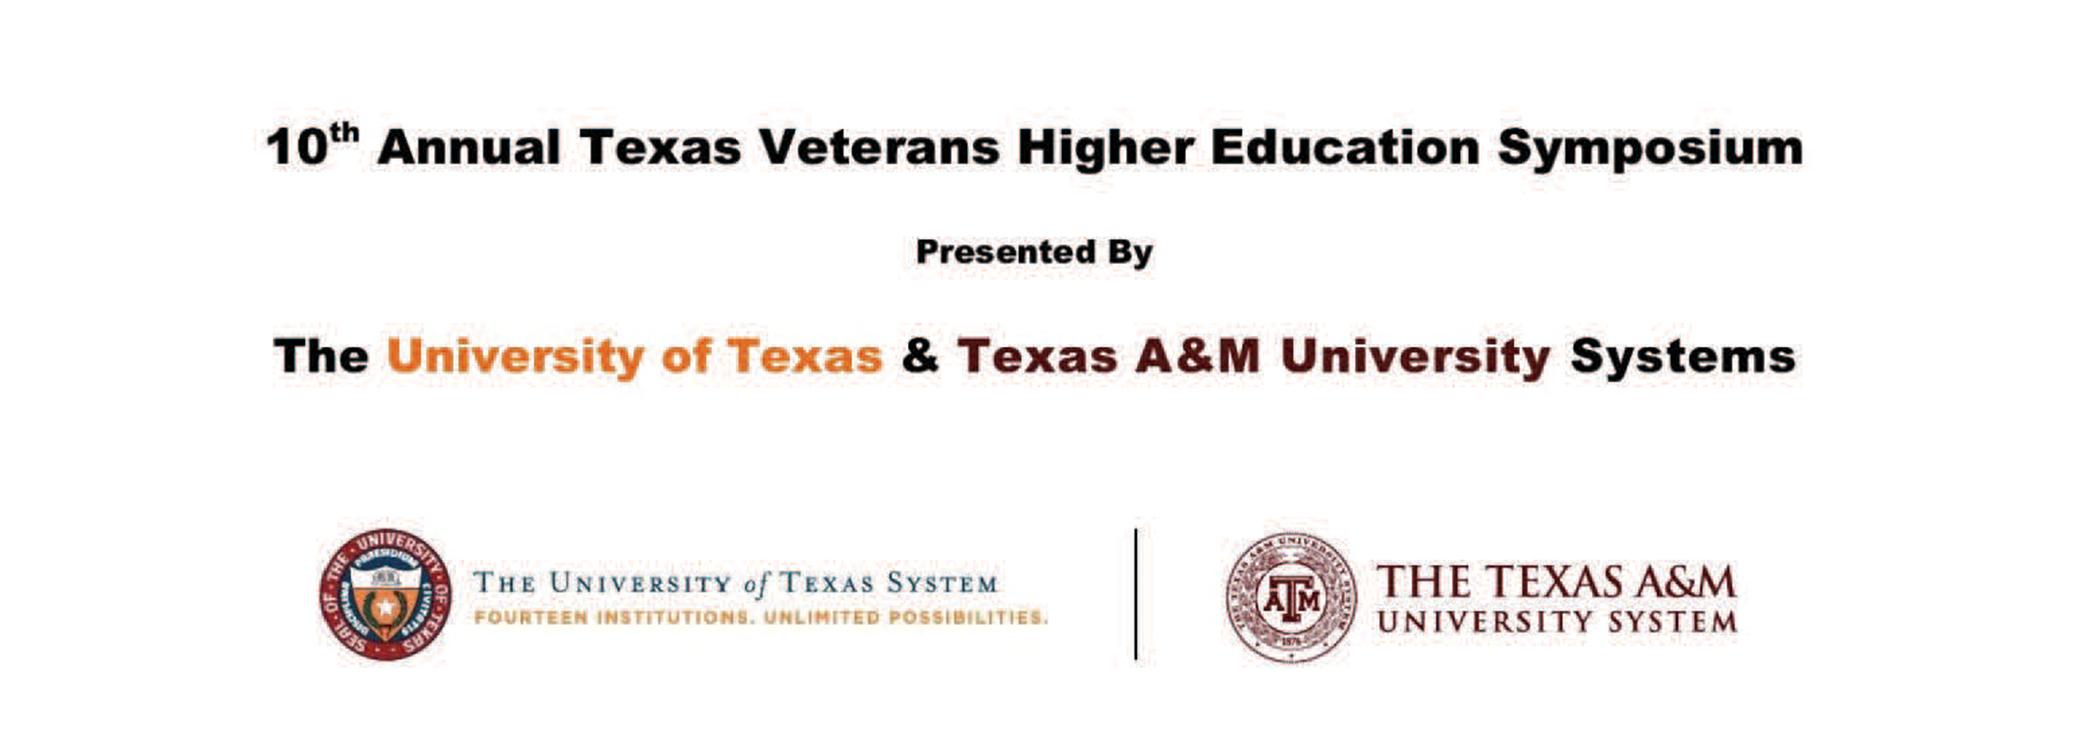 10th Annual Texas Veterans Higher Education Symposium